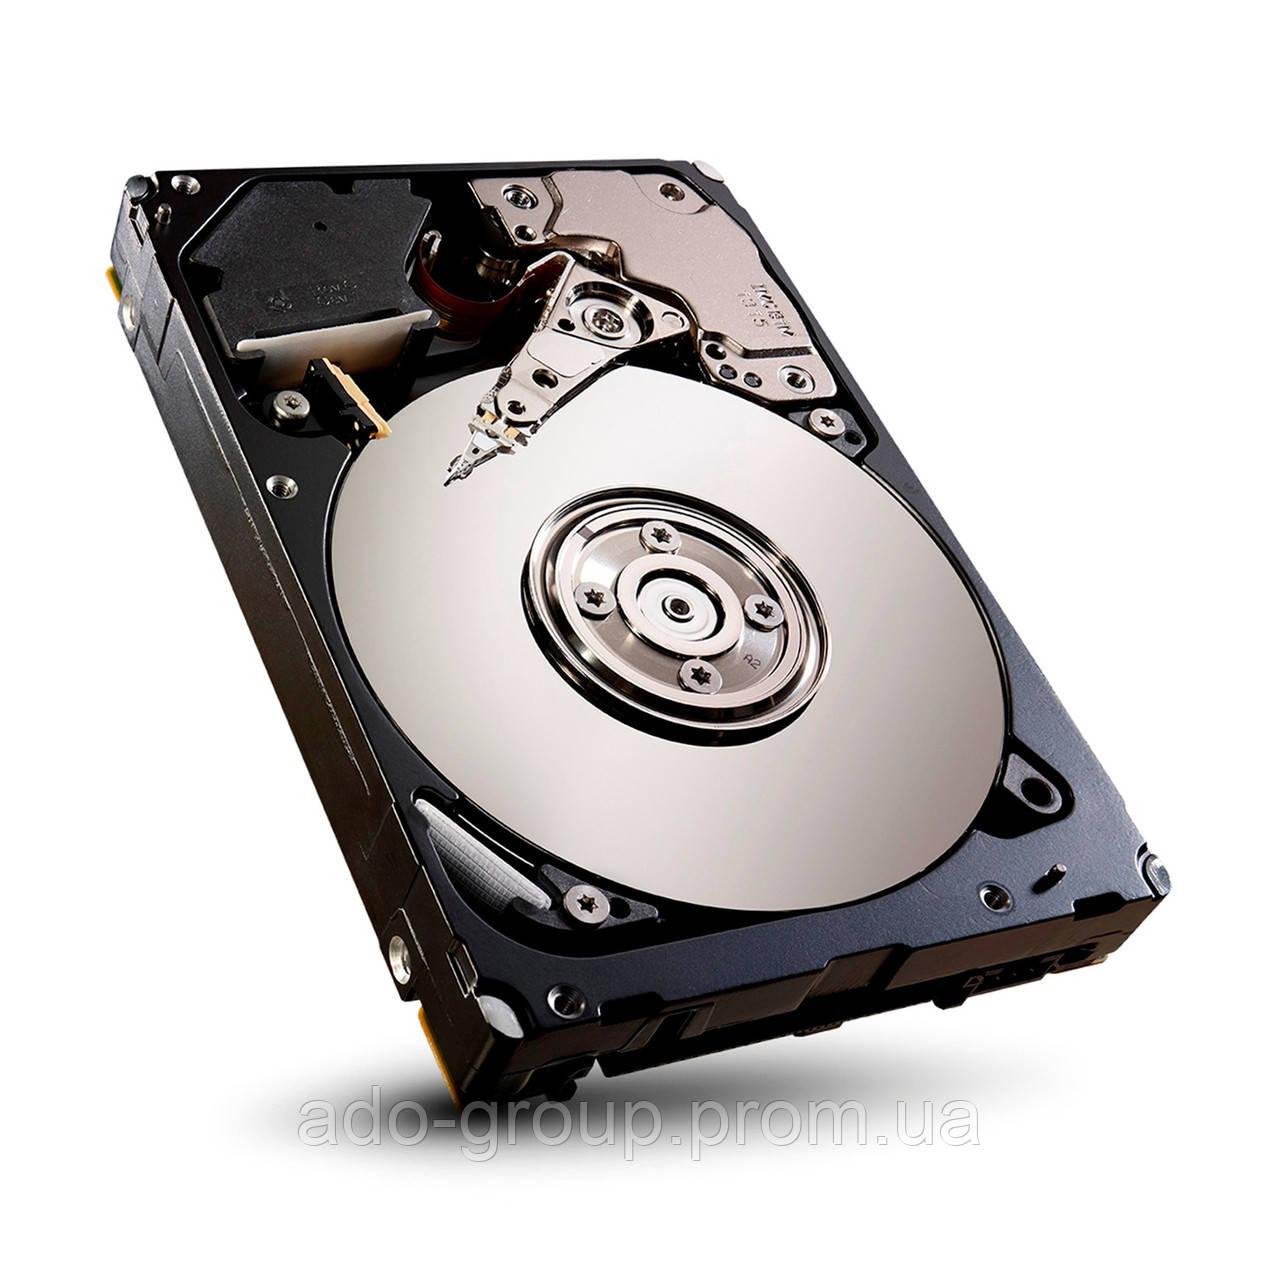 "ST336752LW Жесткий диск Seagate 36GB SCSI 15K U160 3.5"" +"